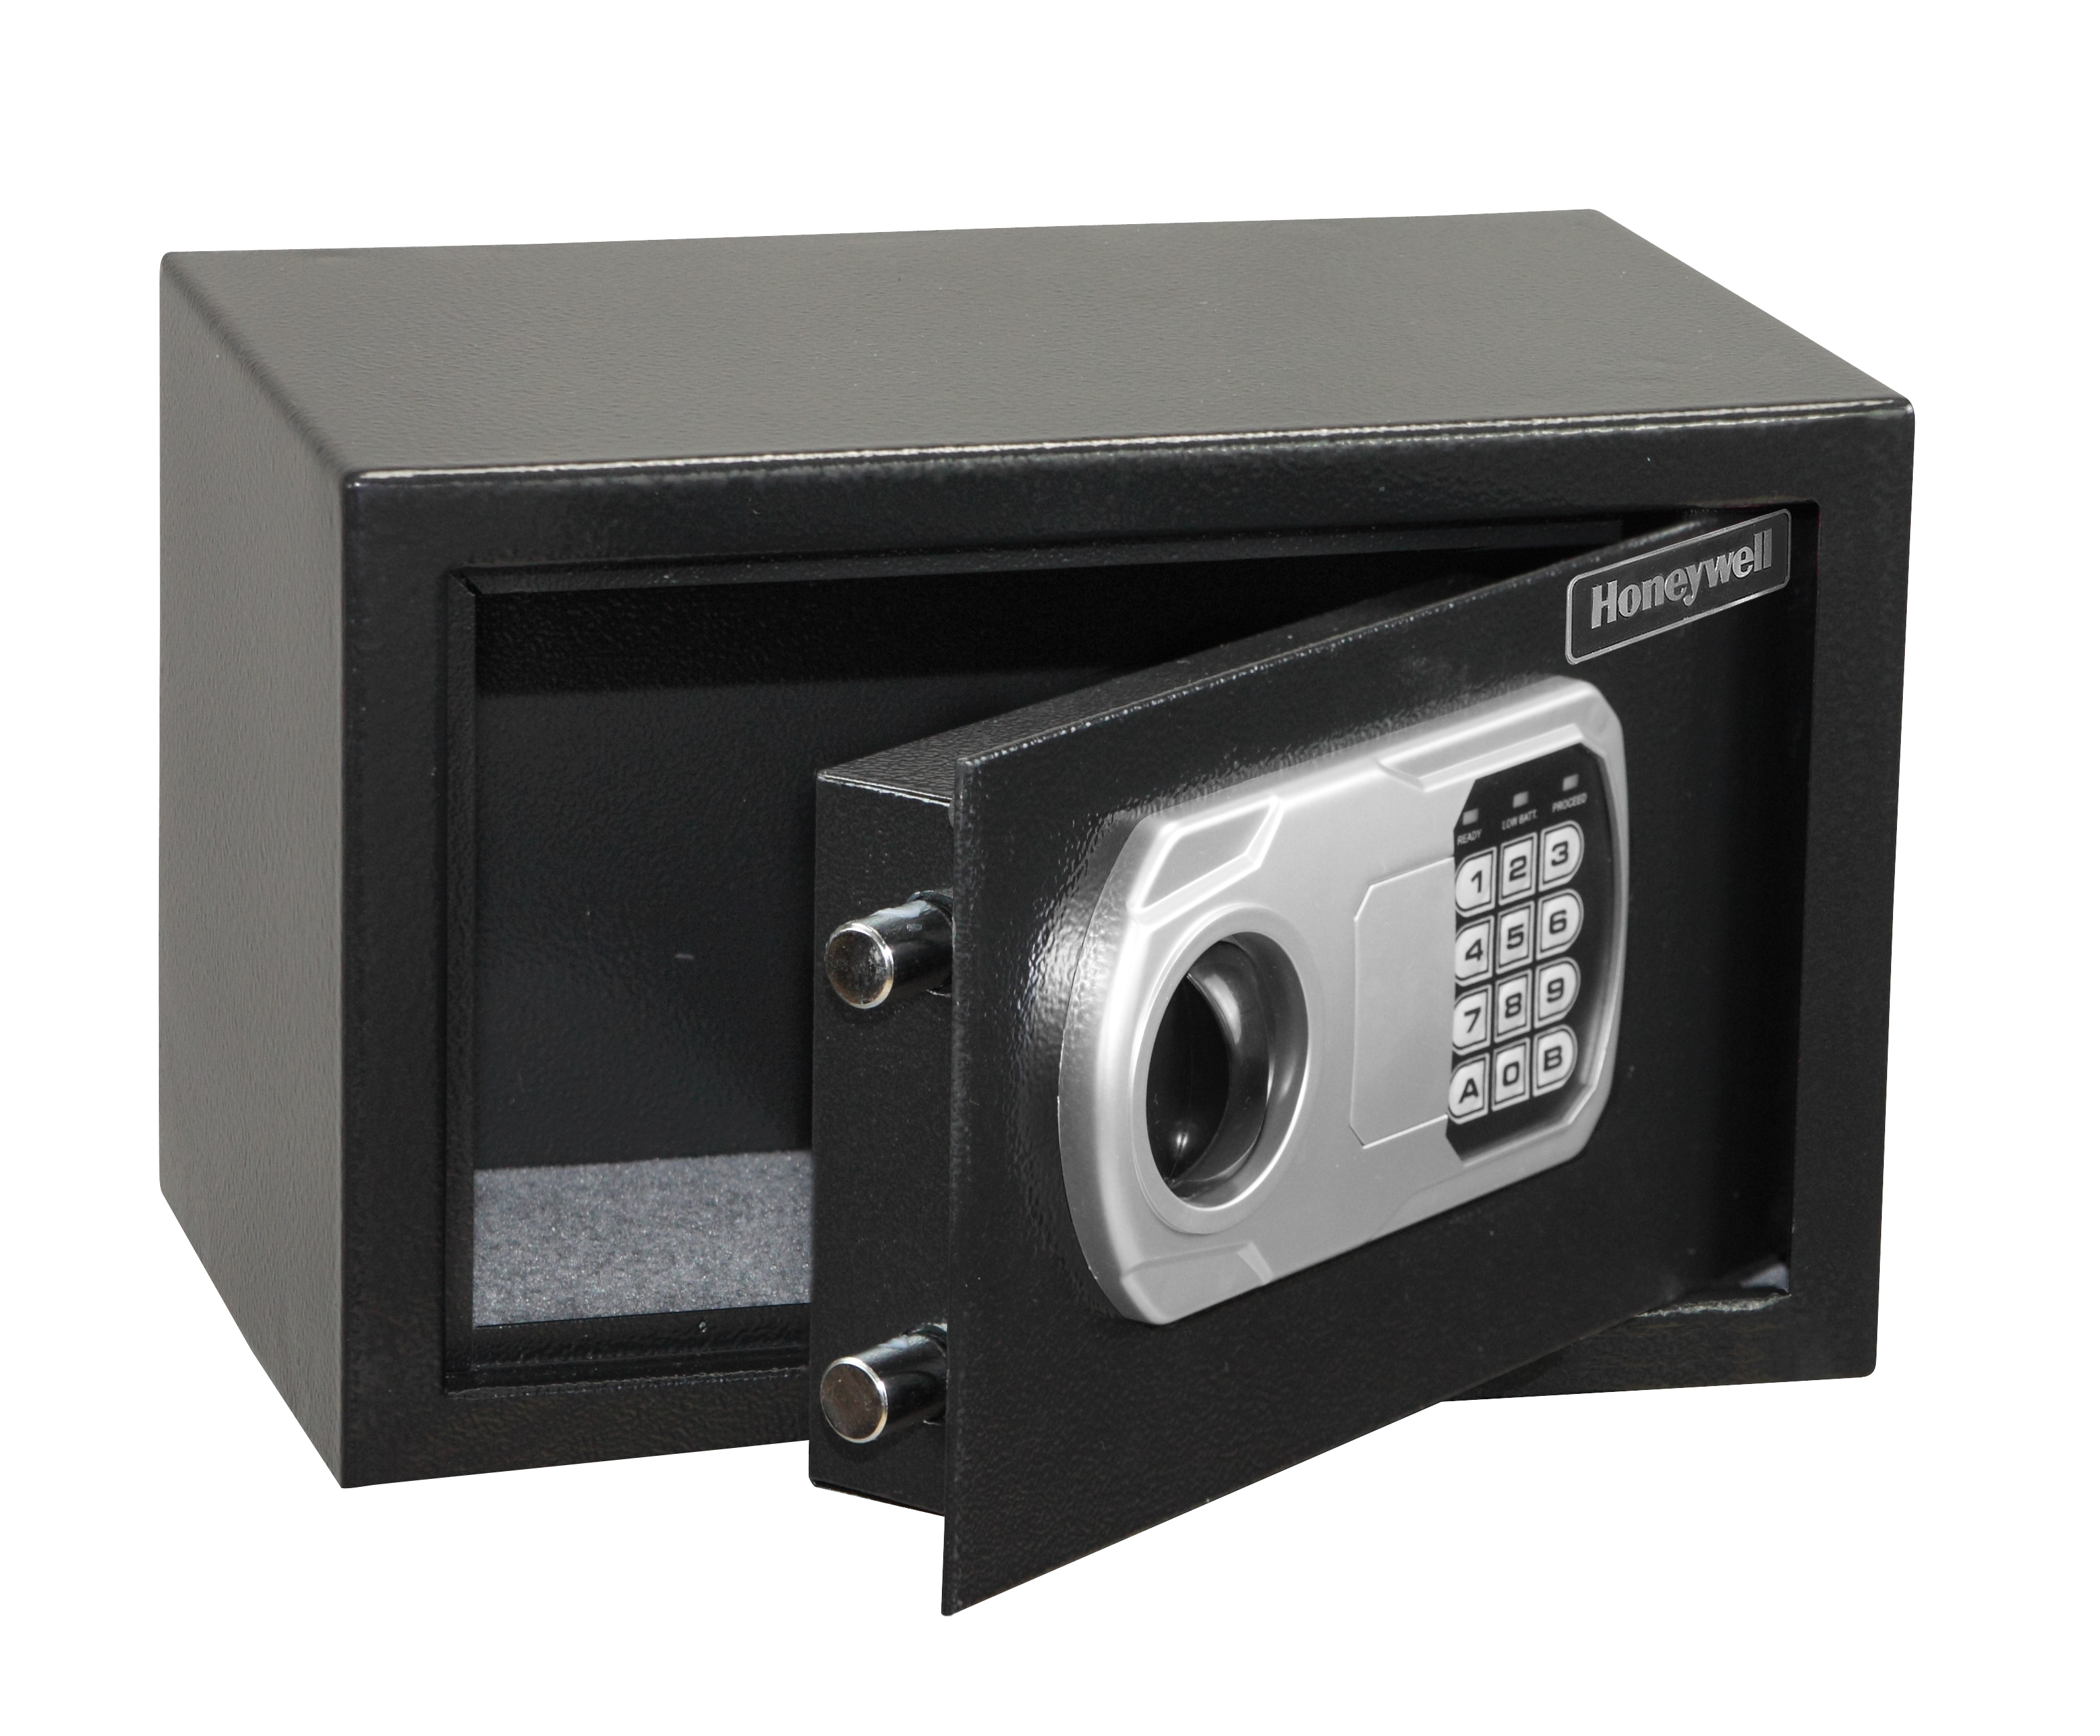 DOJ Approved Steel Security Safe With Digital Lock, 5101DOJ